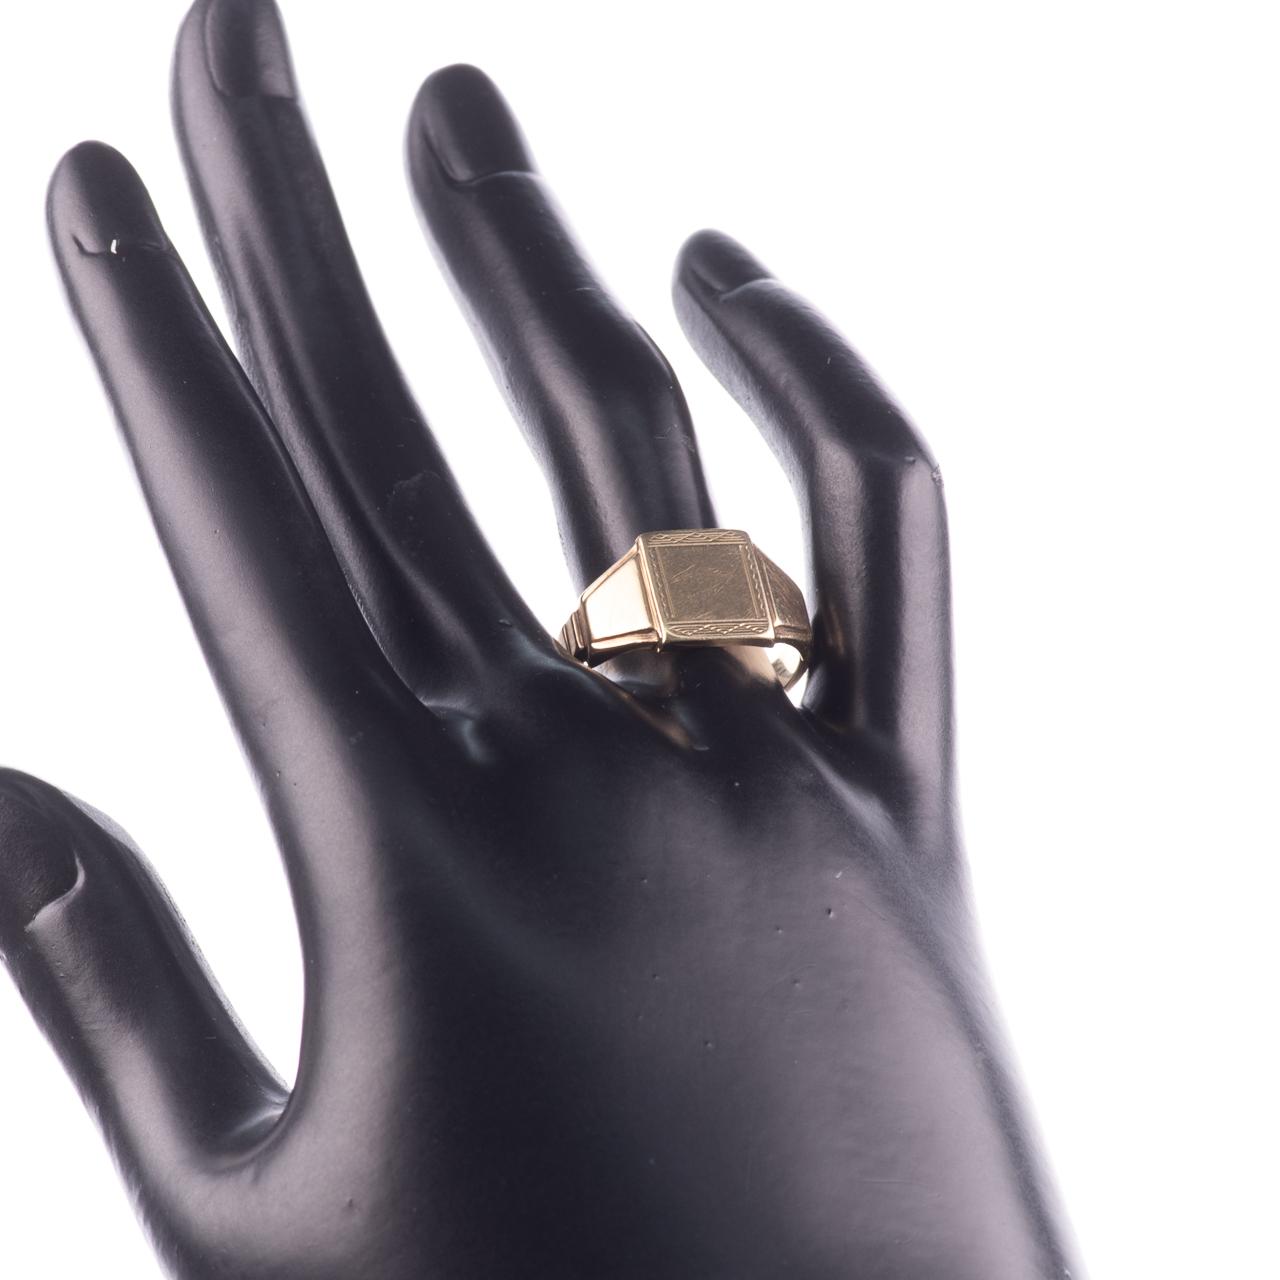 Art Deco Style Gentleman's Signet Ring 9ct Gold - Image 2 of 7